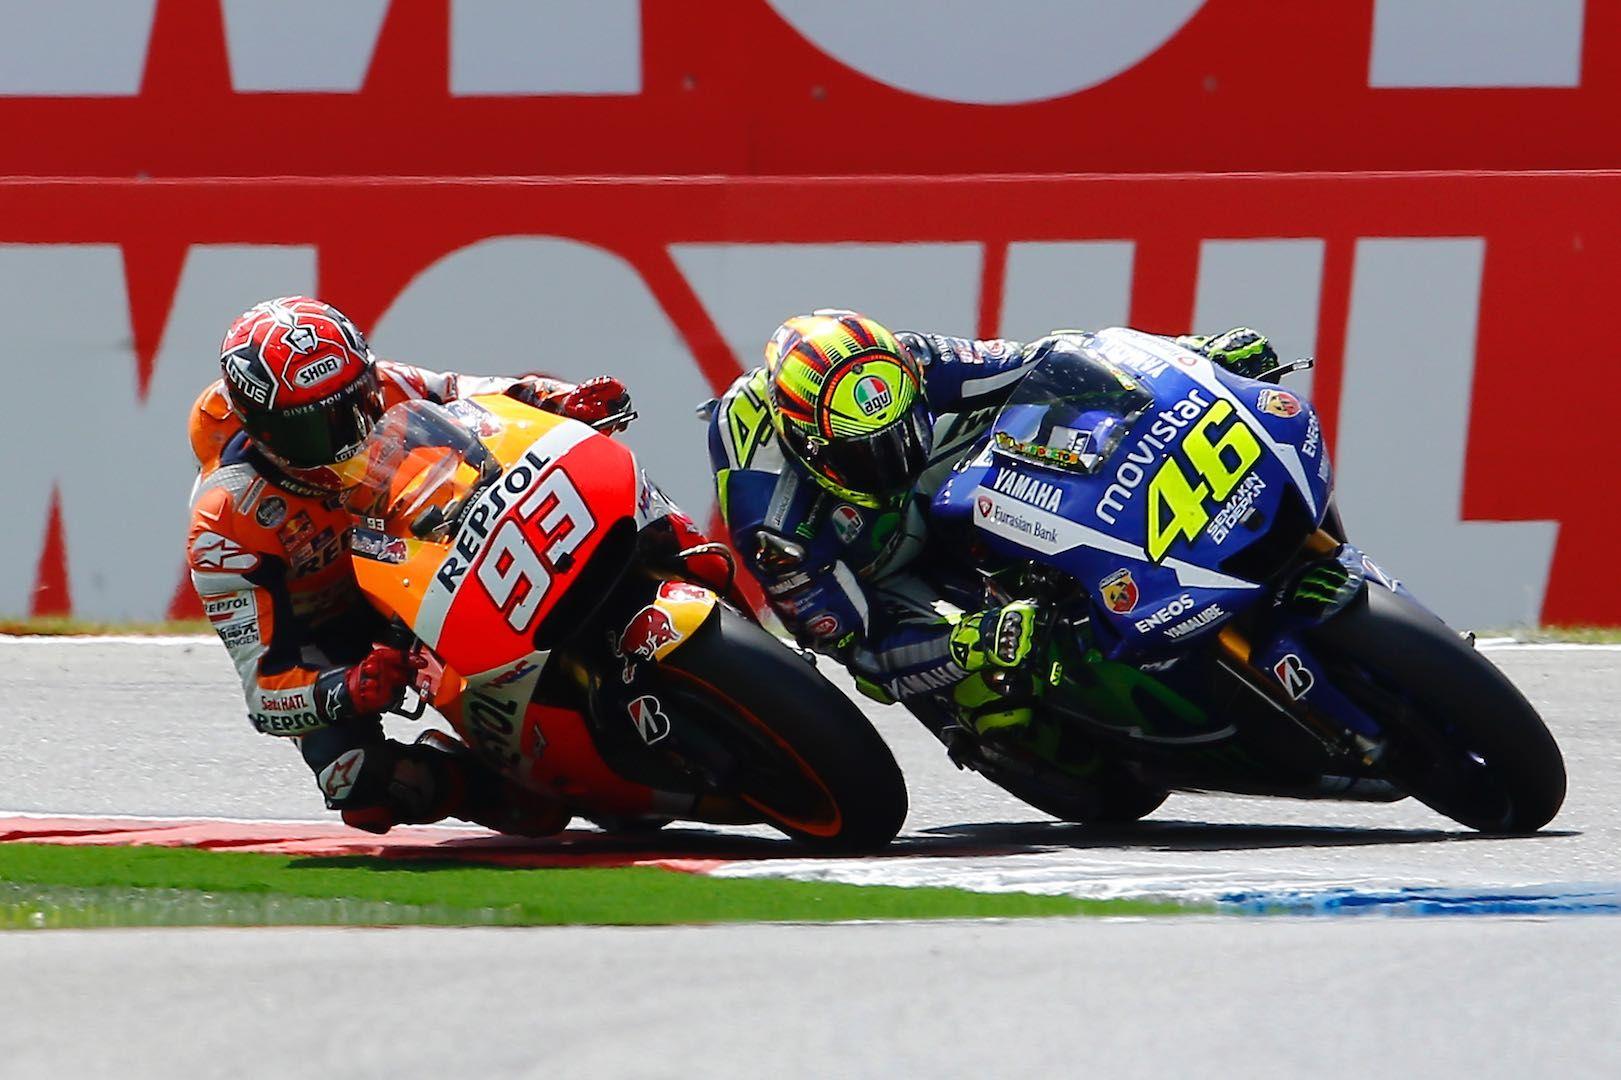 Austin MotoGP Live 2019 Stream Motogp, Grand prix